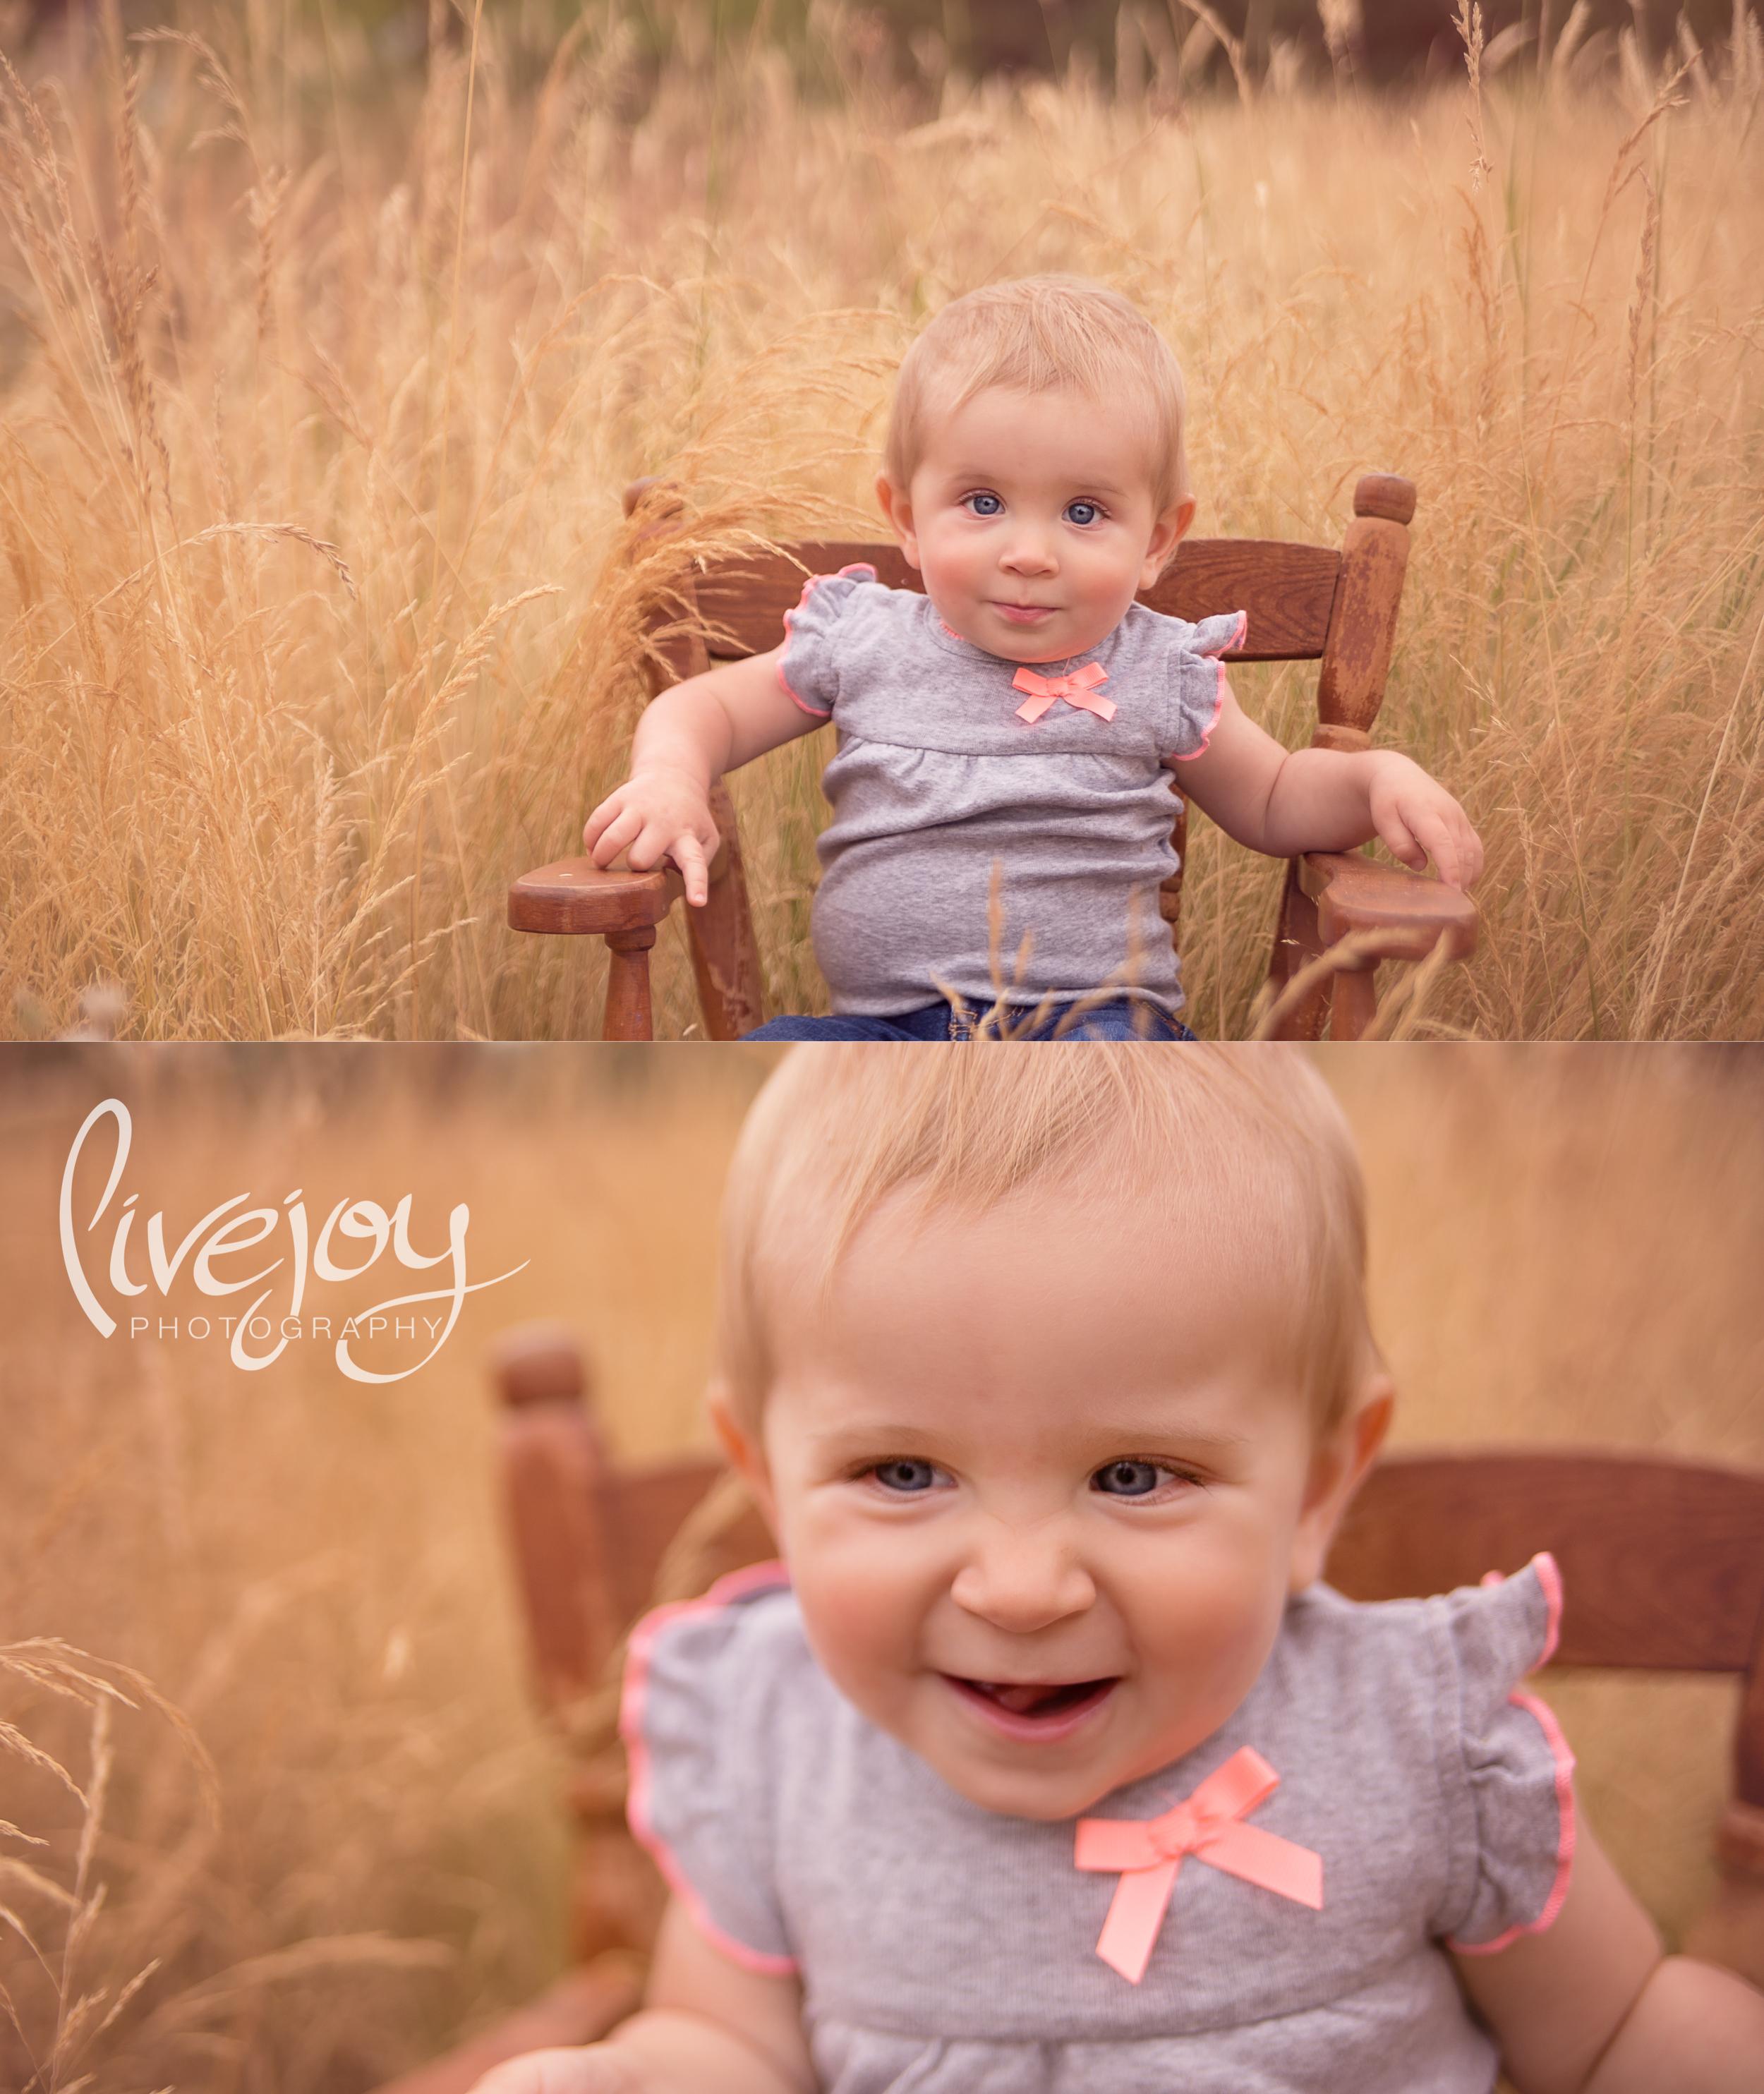 One Year Baby Girl Photos   Oregon   LiveJoy Photography